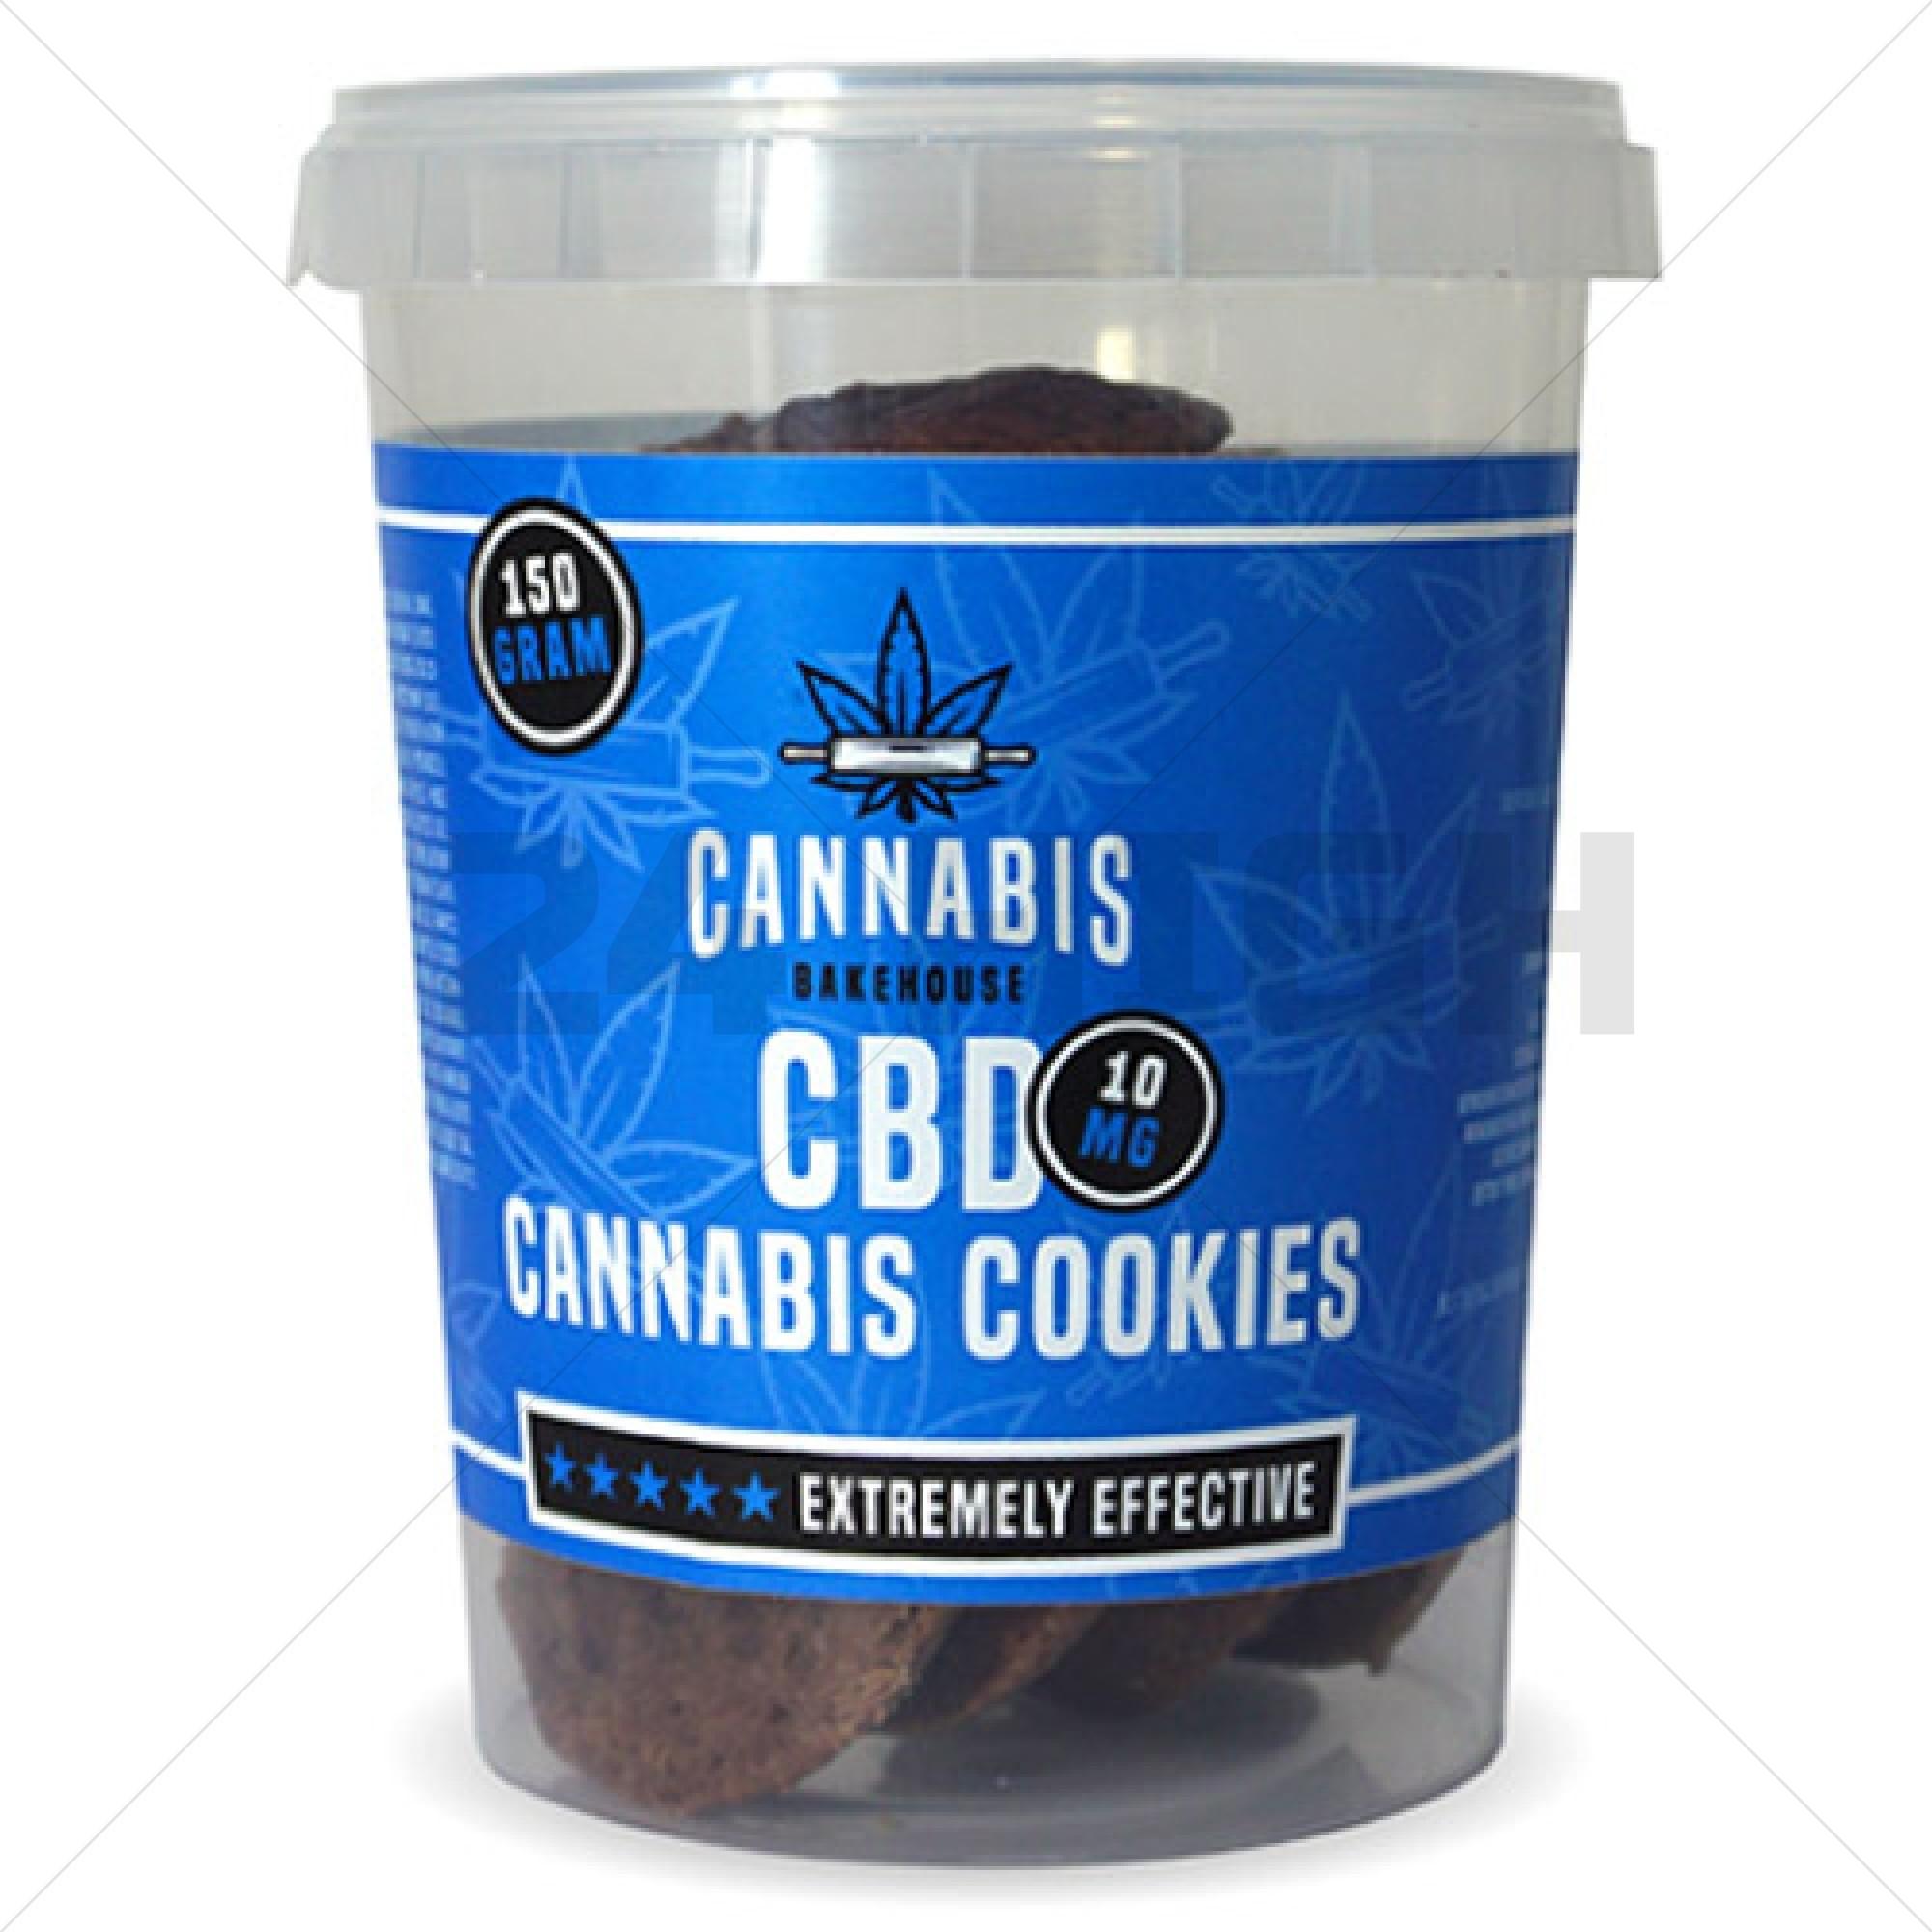 Cannabis Bakehouse CBD Cookies